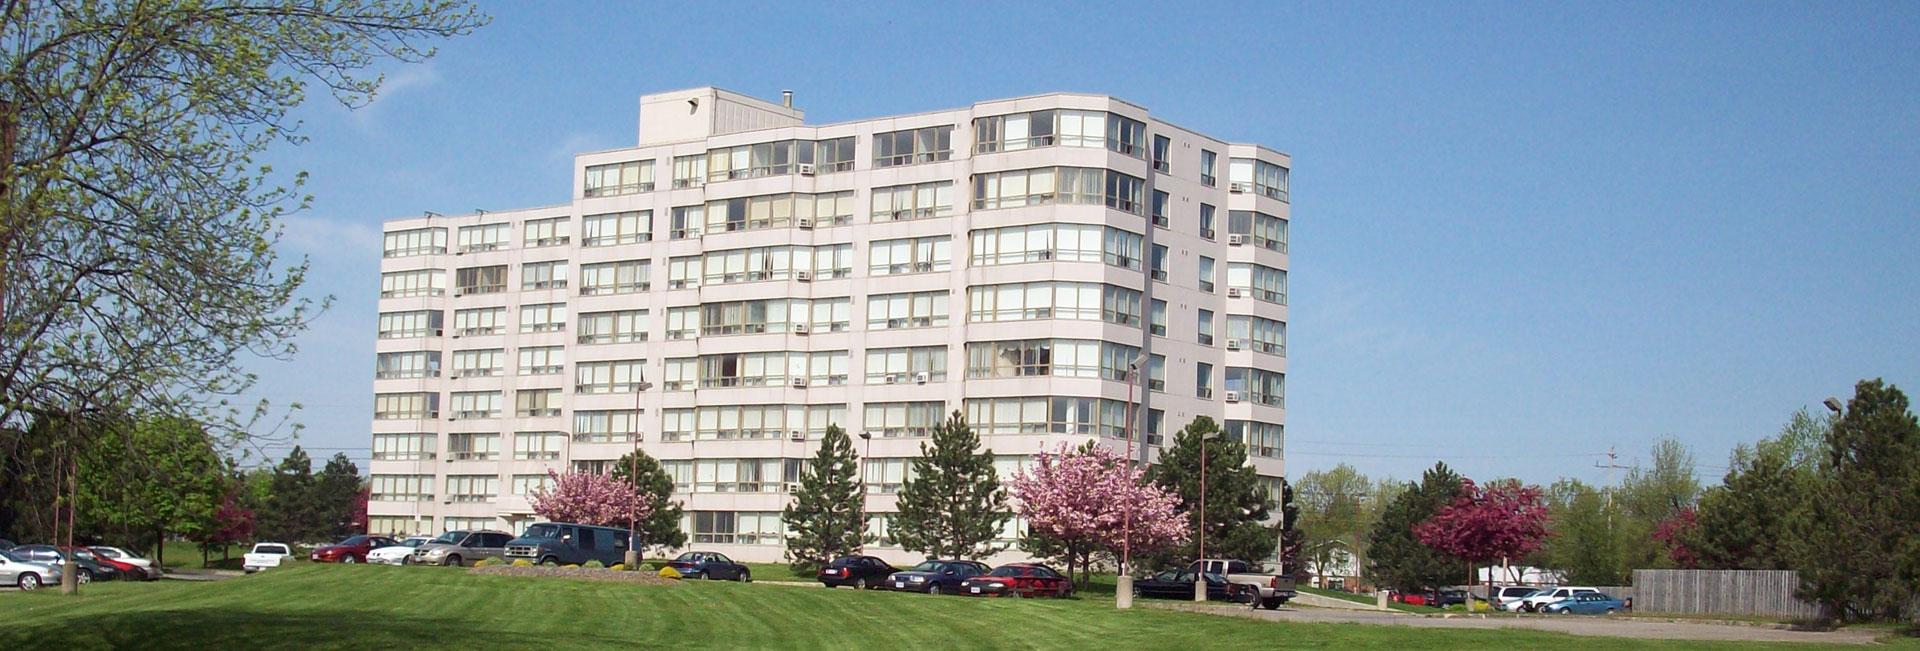 Parkway Village Apartment Building